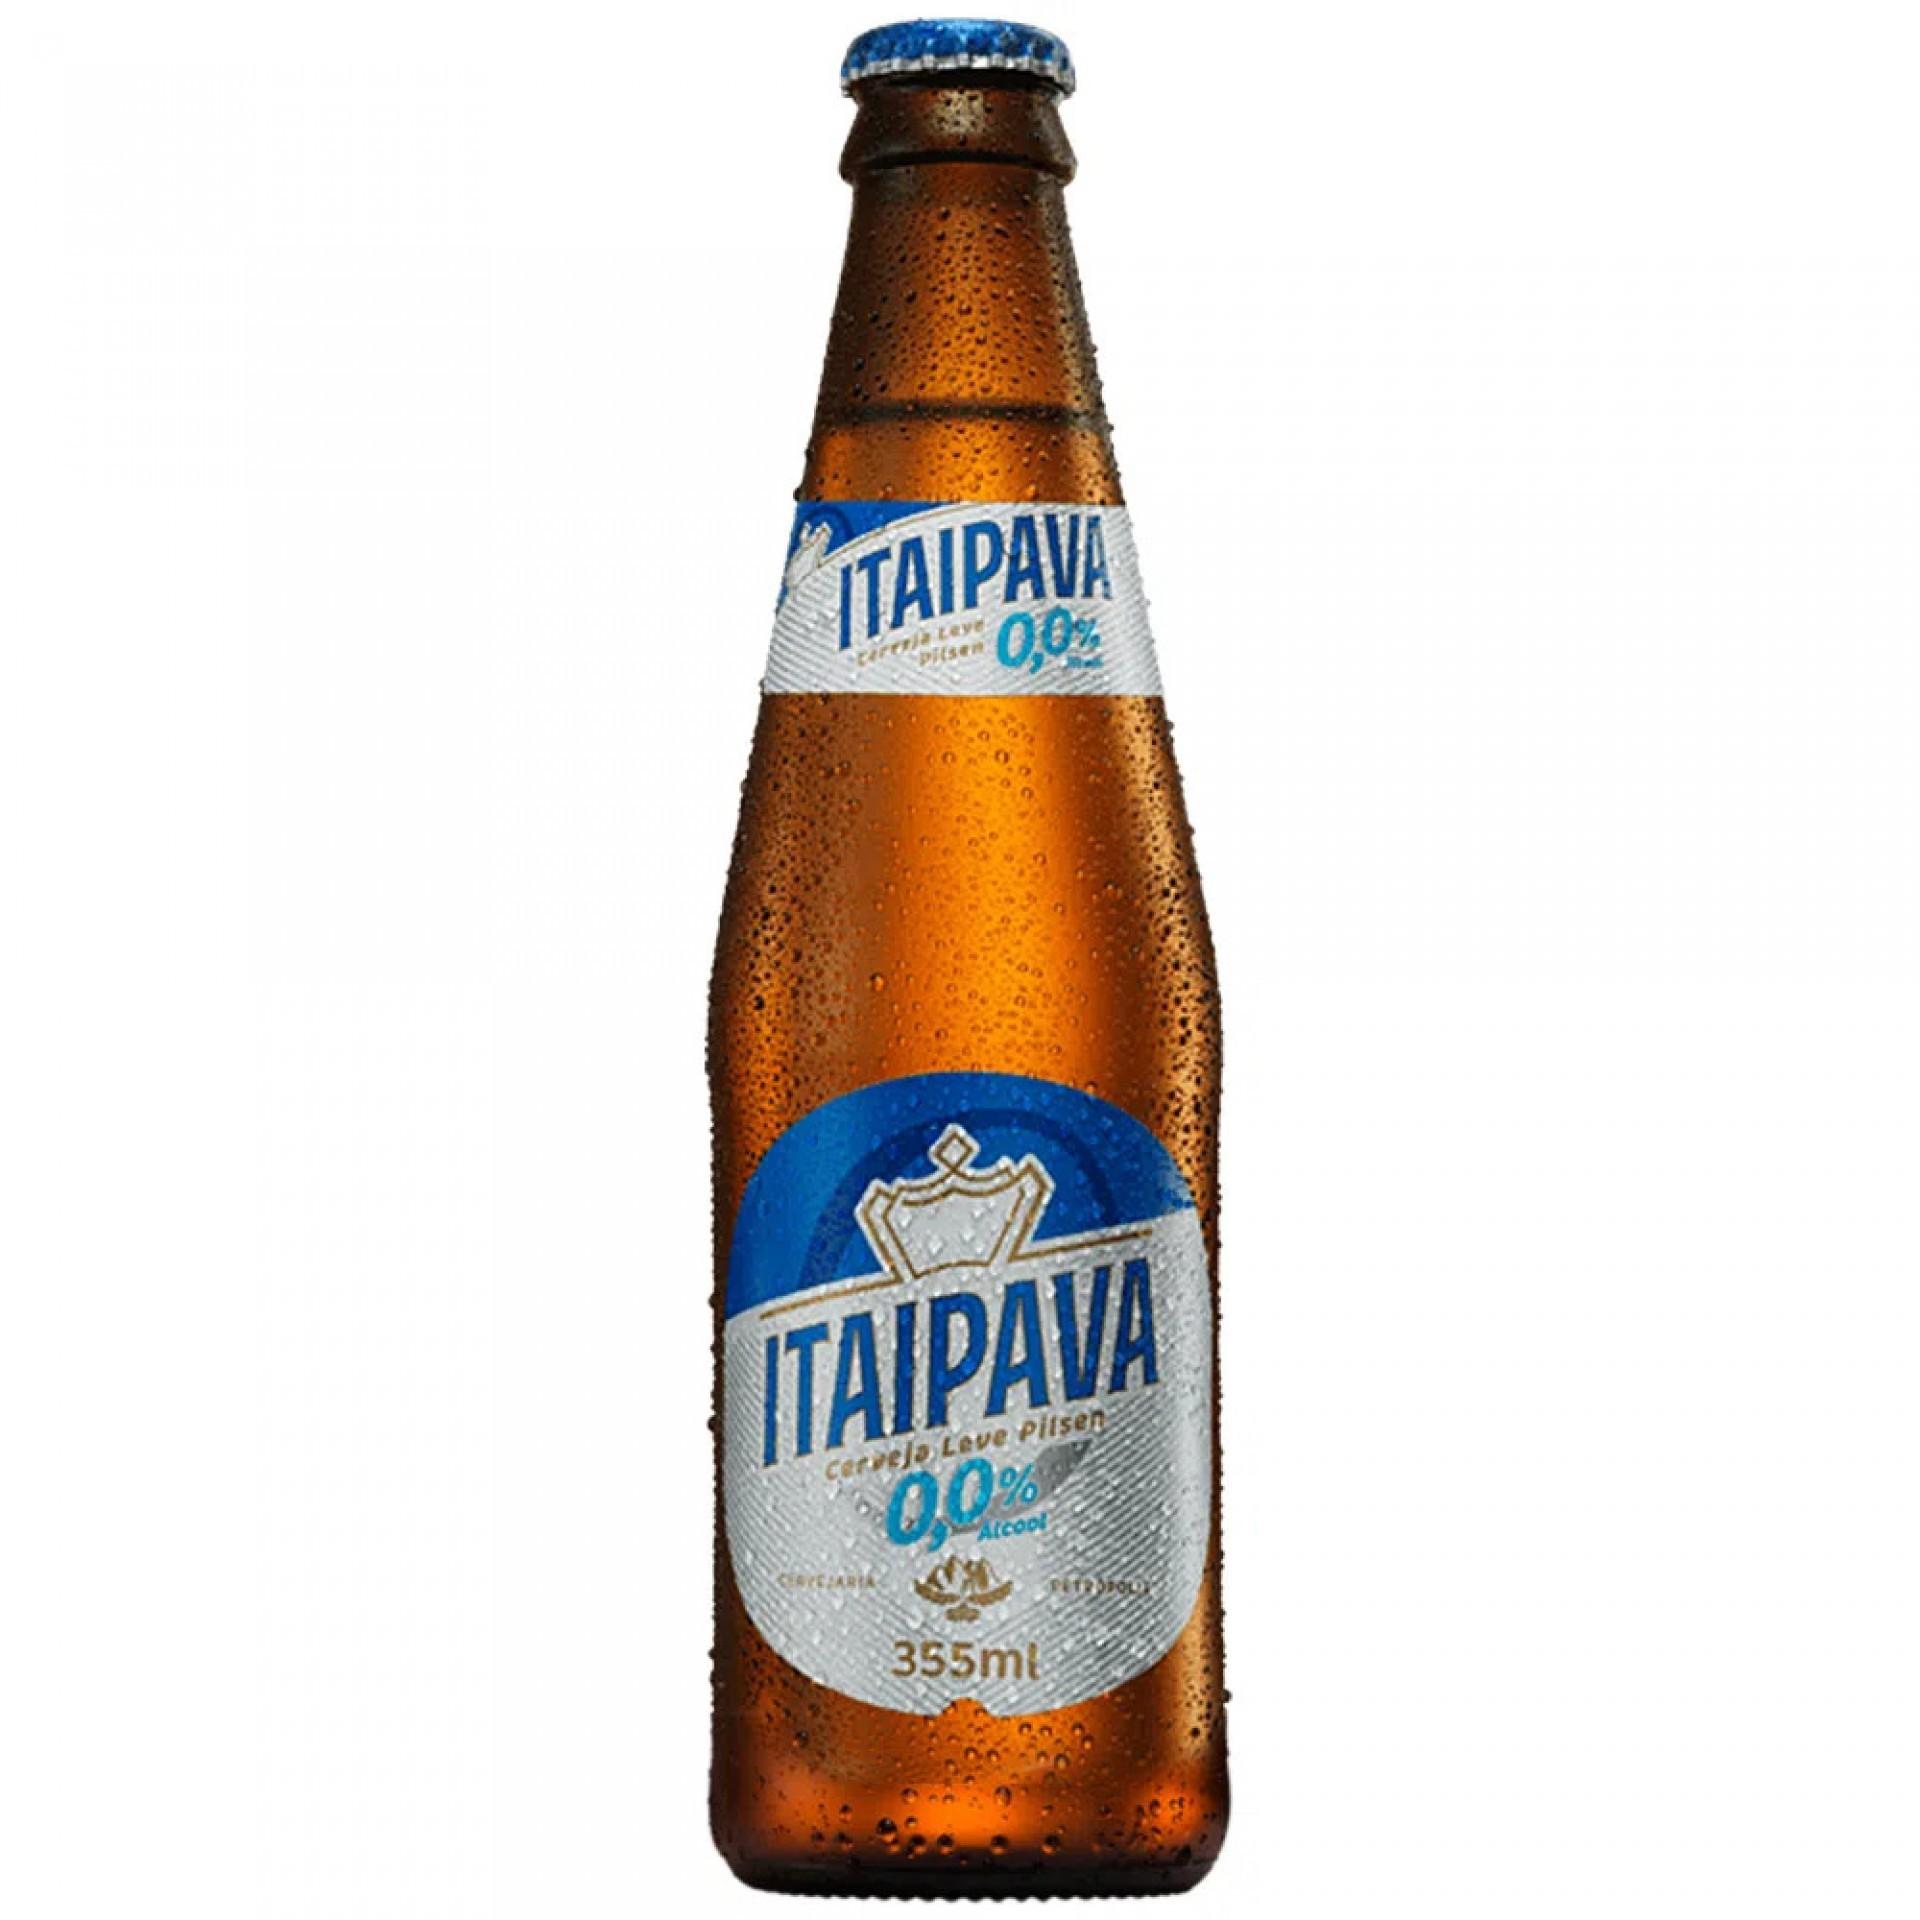 (Foto: Reprodução/Internet)Cerveja Zero Álcool Itaipava 355ml - A partir de R$ 3,23 (iFood)